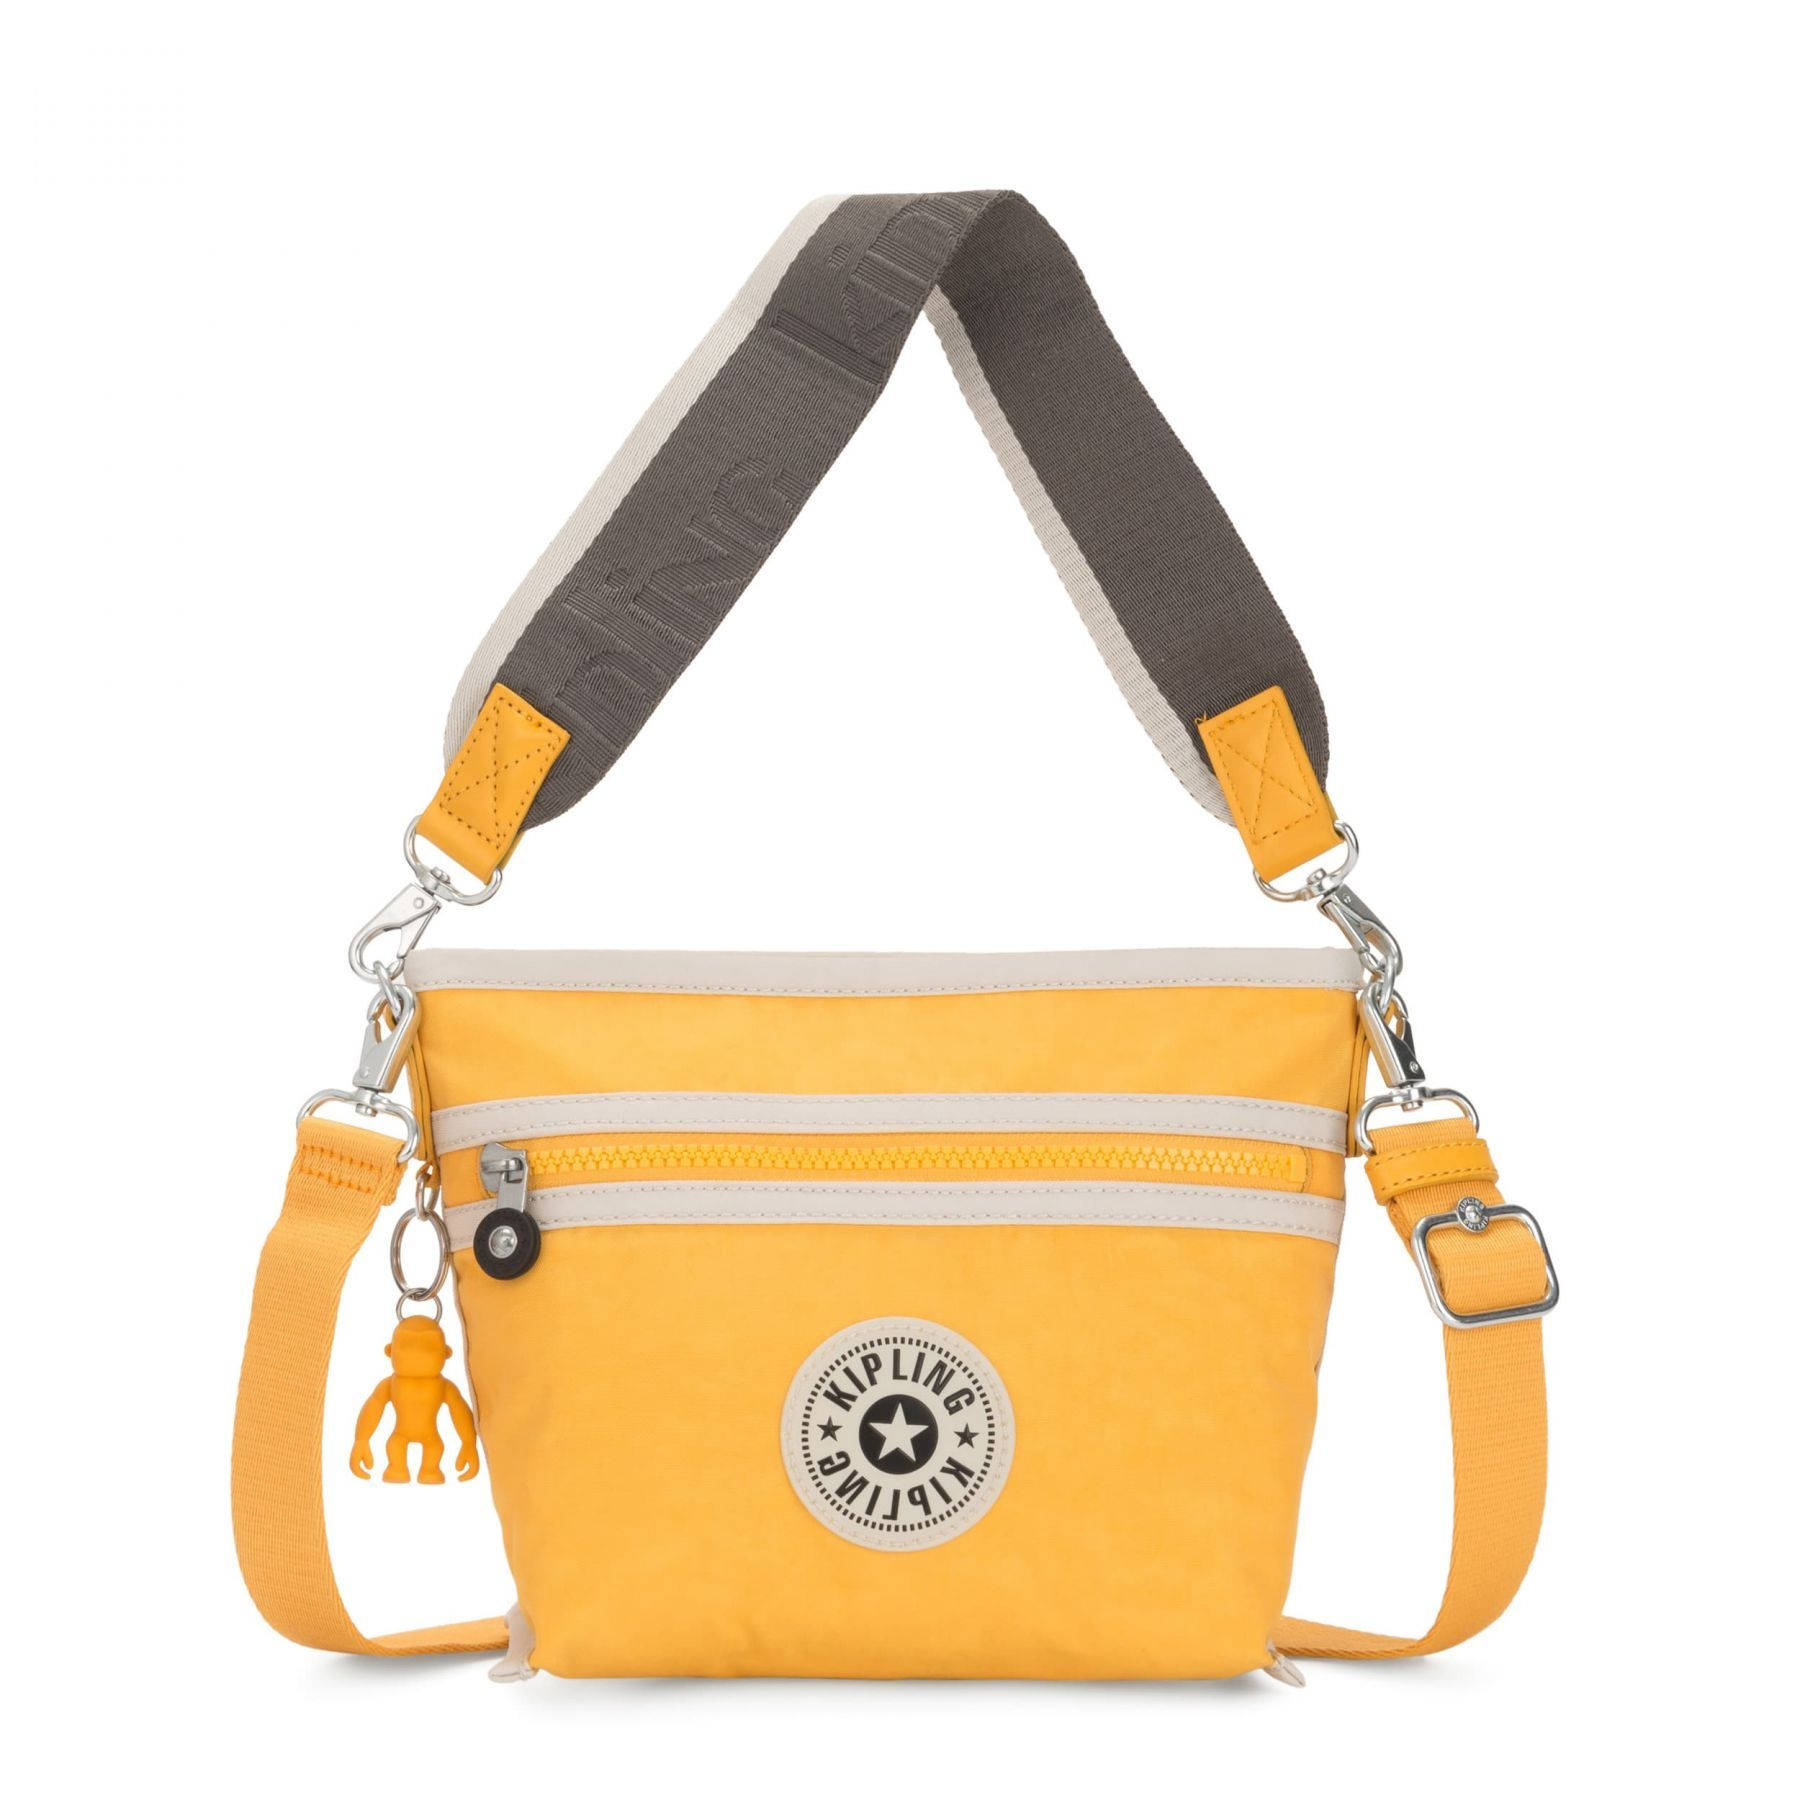 Bolsa Pequena Kipling Menta Vivid Yellow